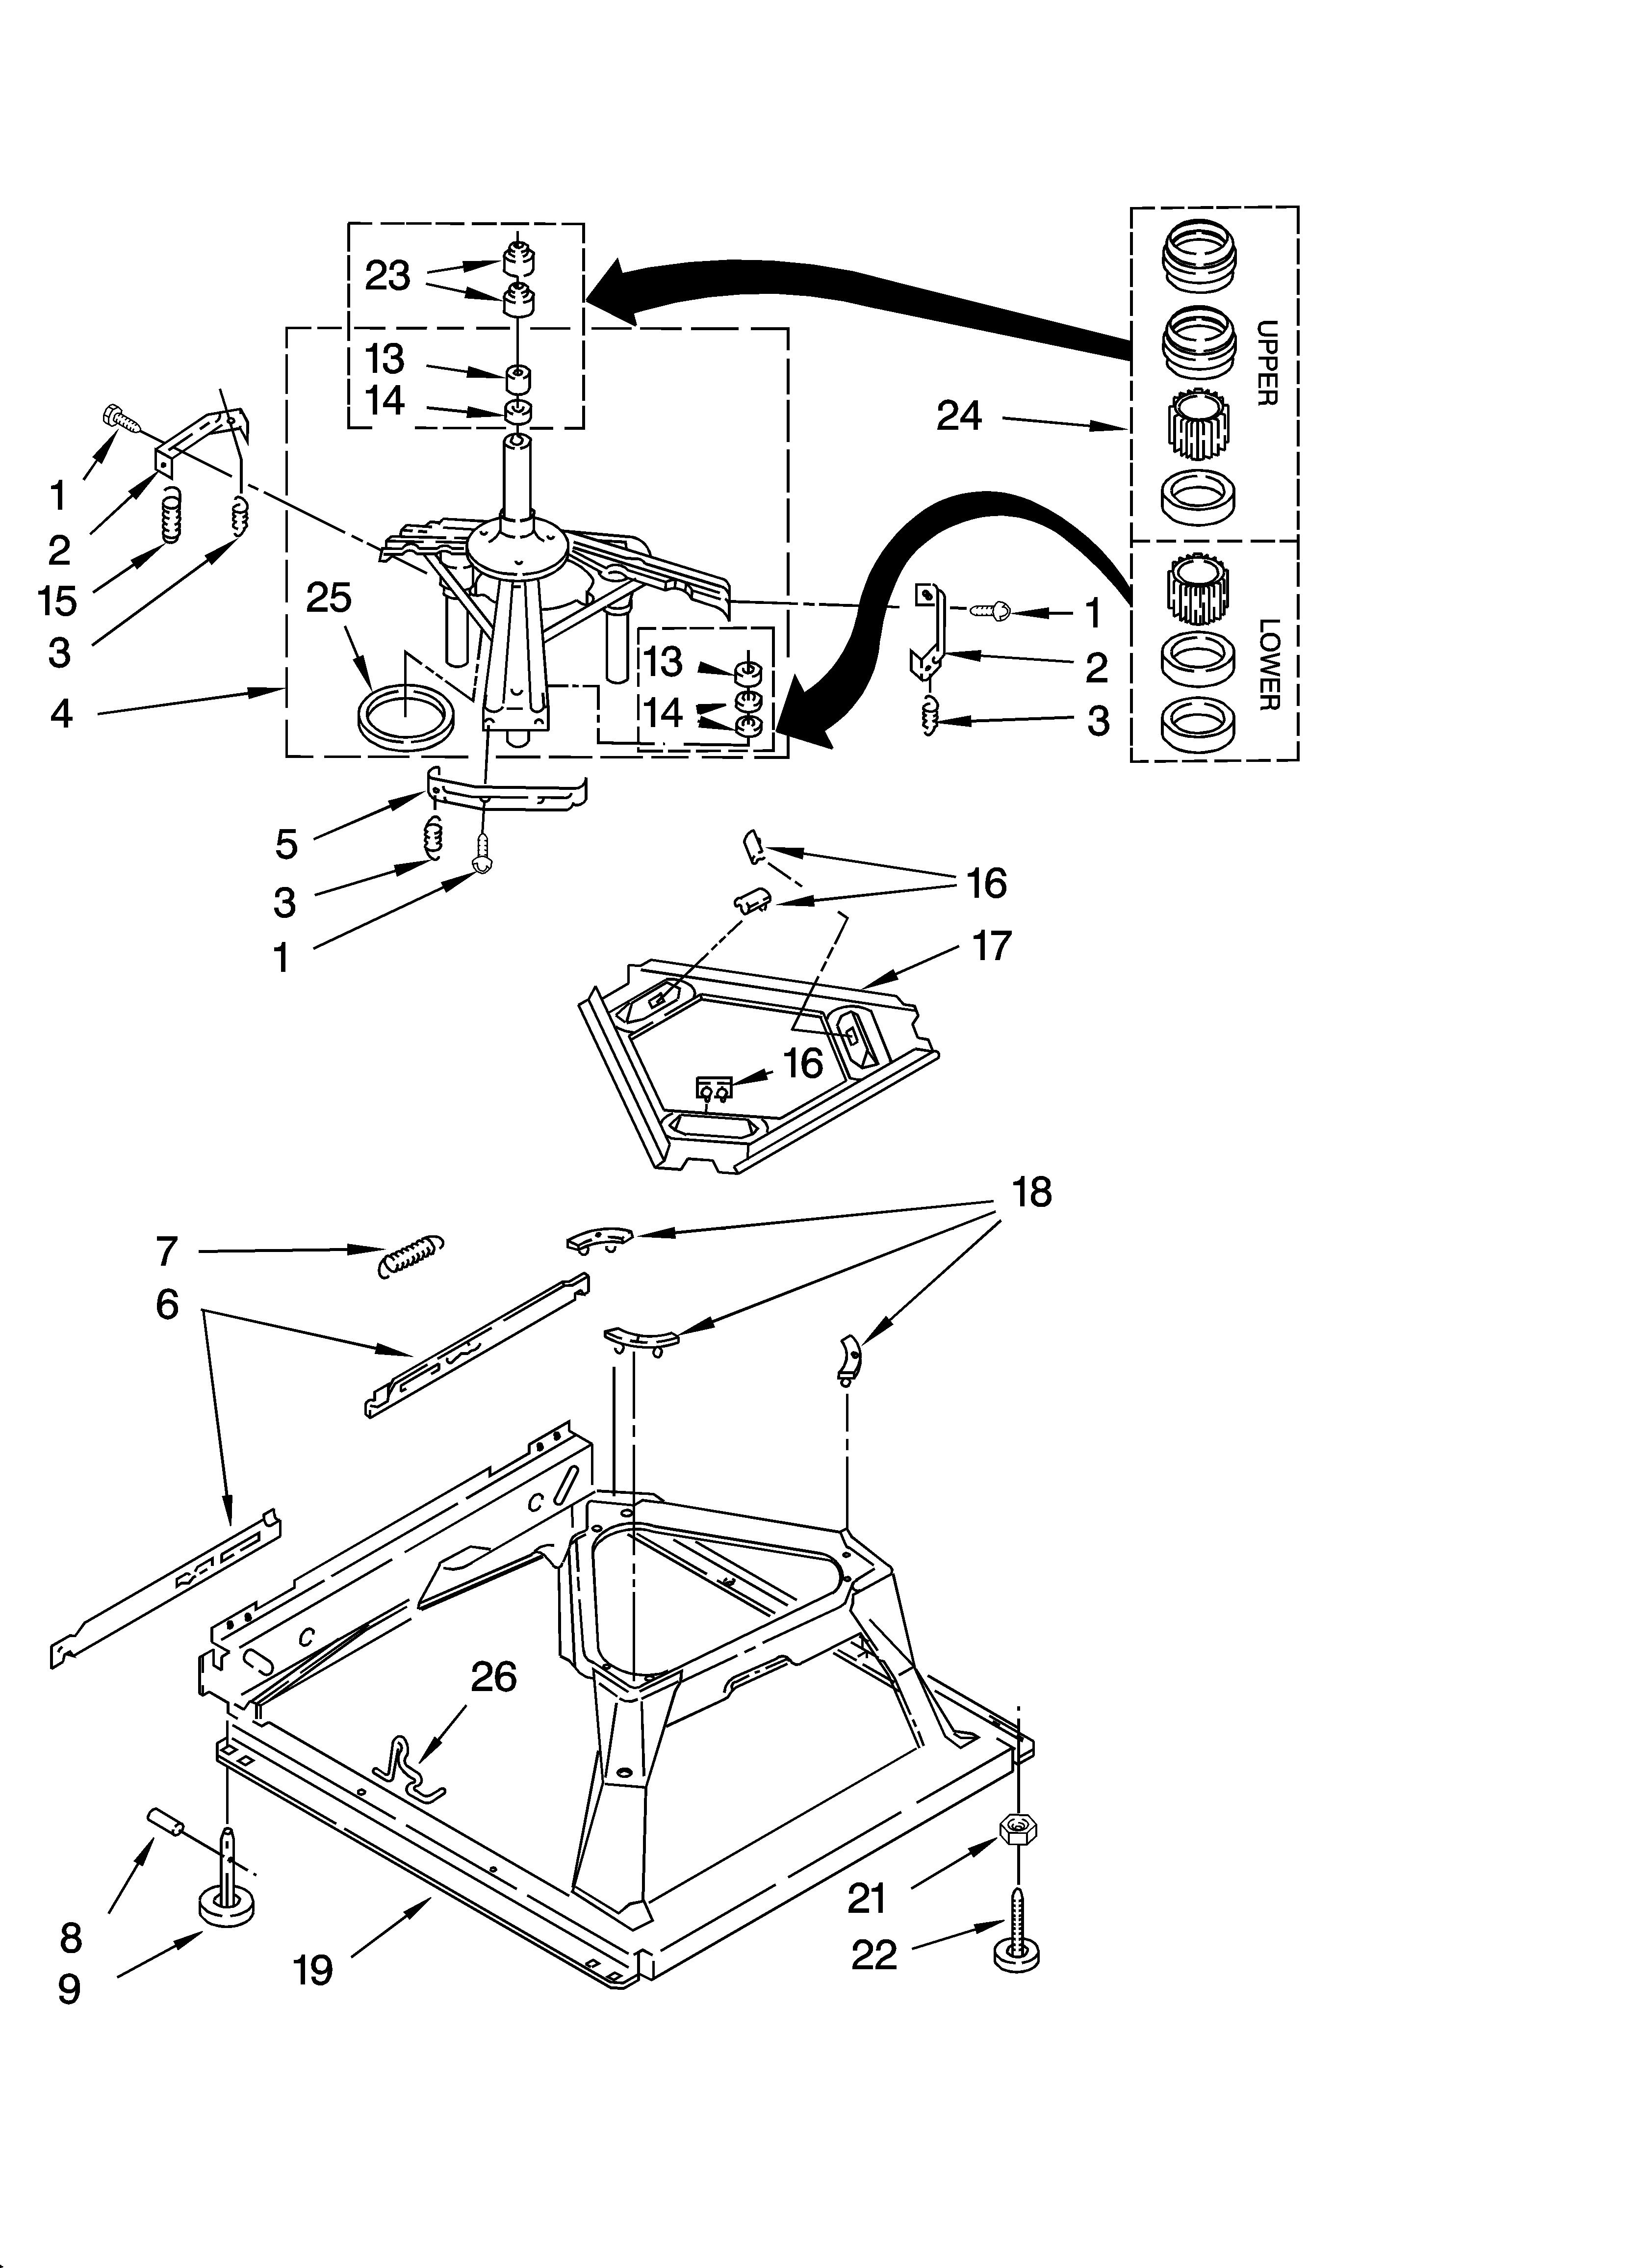 kenmore elite washer wiring diagram 3955735 model 11023032100 rh w51 blacz de